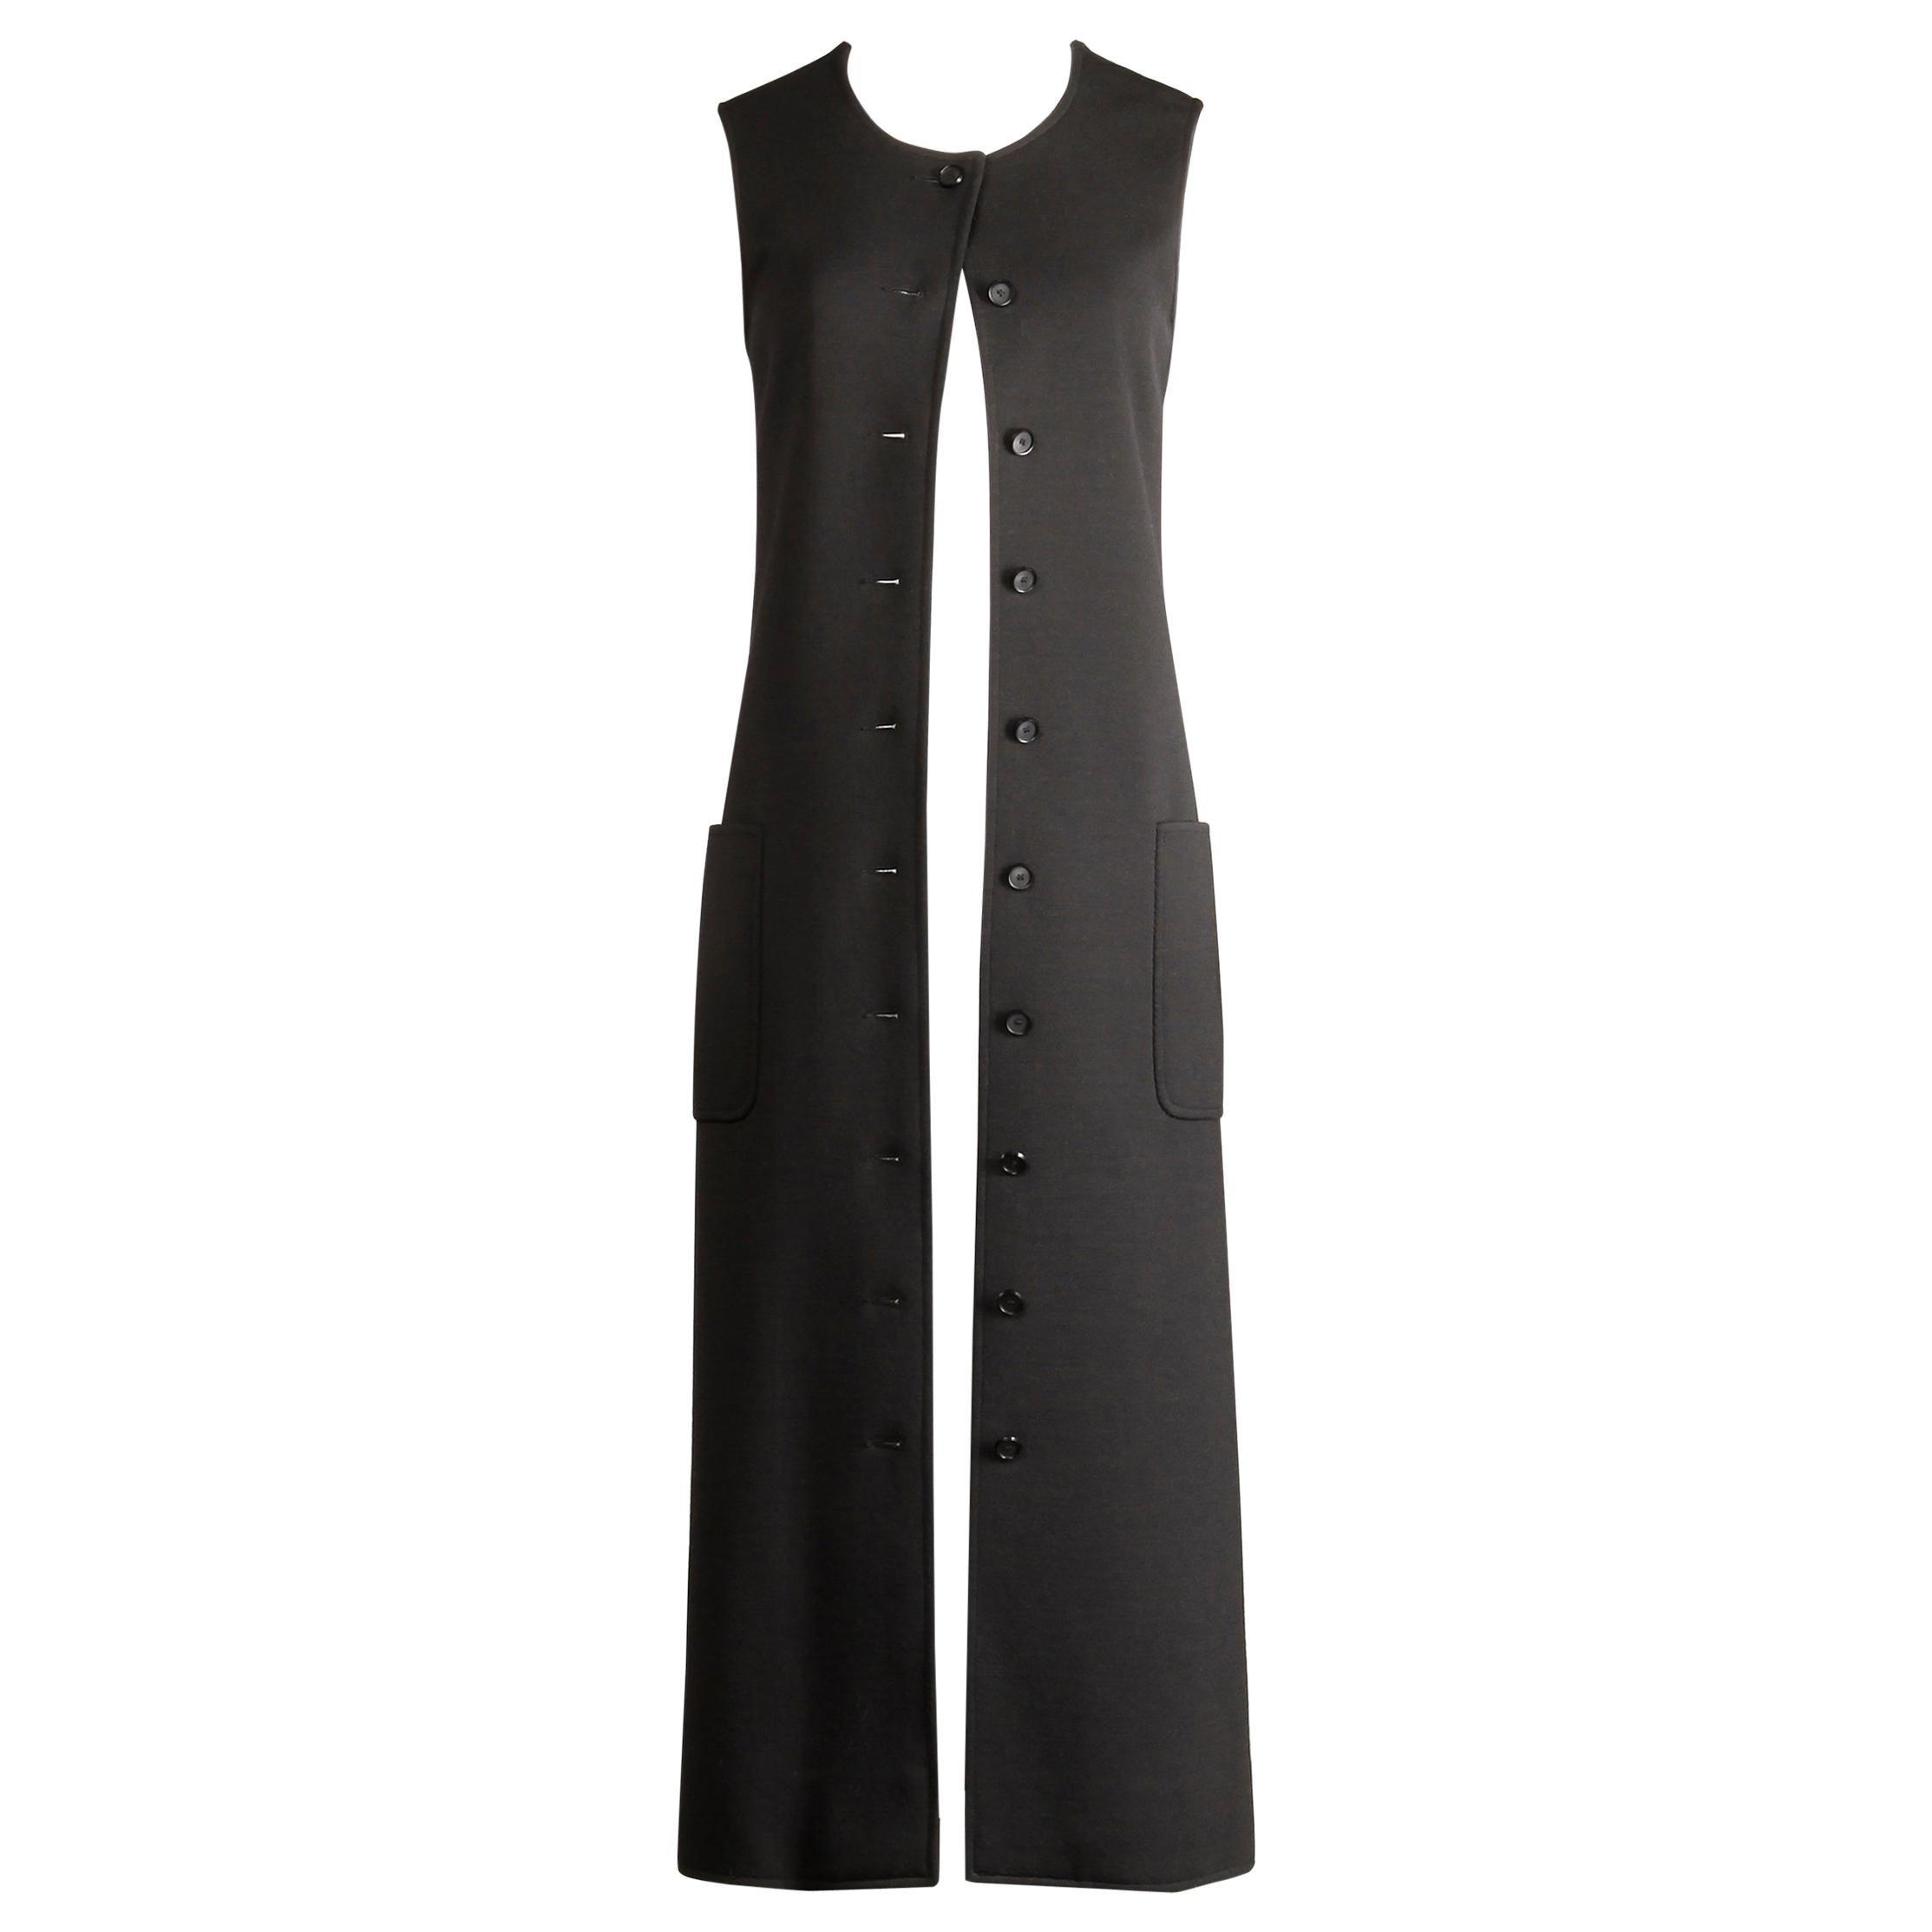 Rare 1970s Yves Saint Laurent YSL Vintage Long Black Wool Maxi Vest or Dress